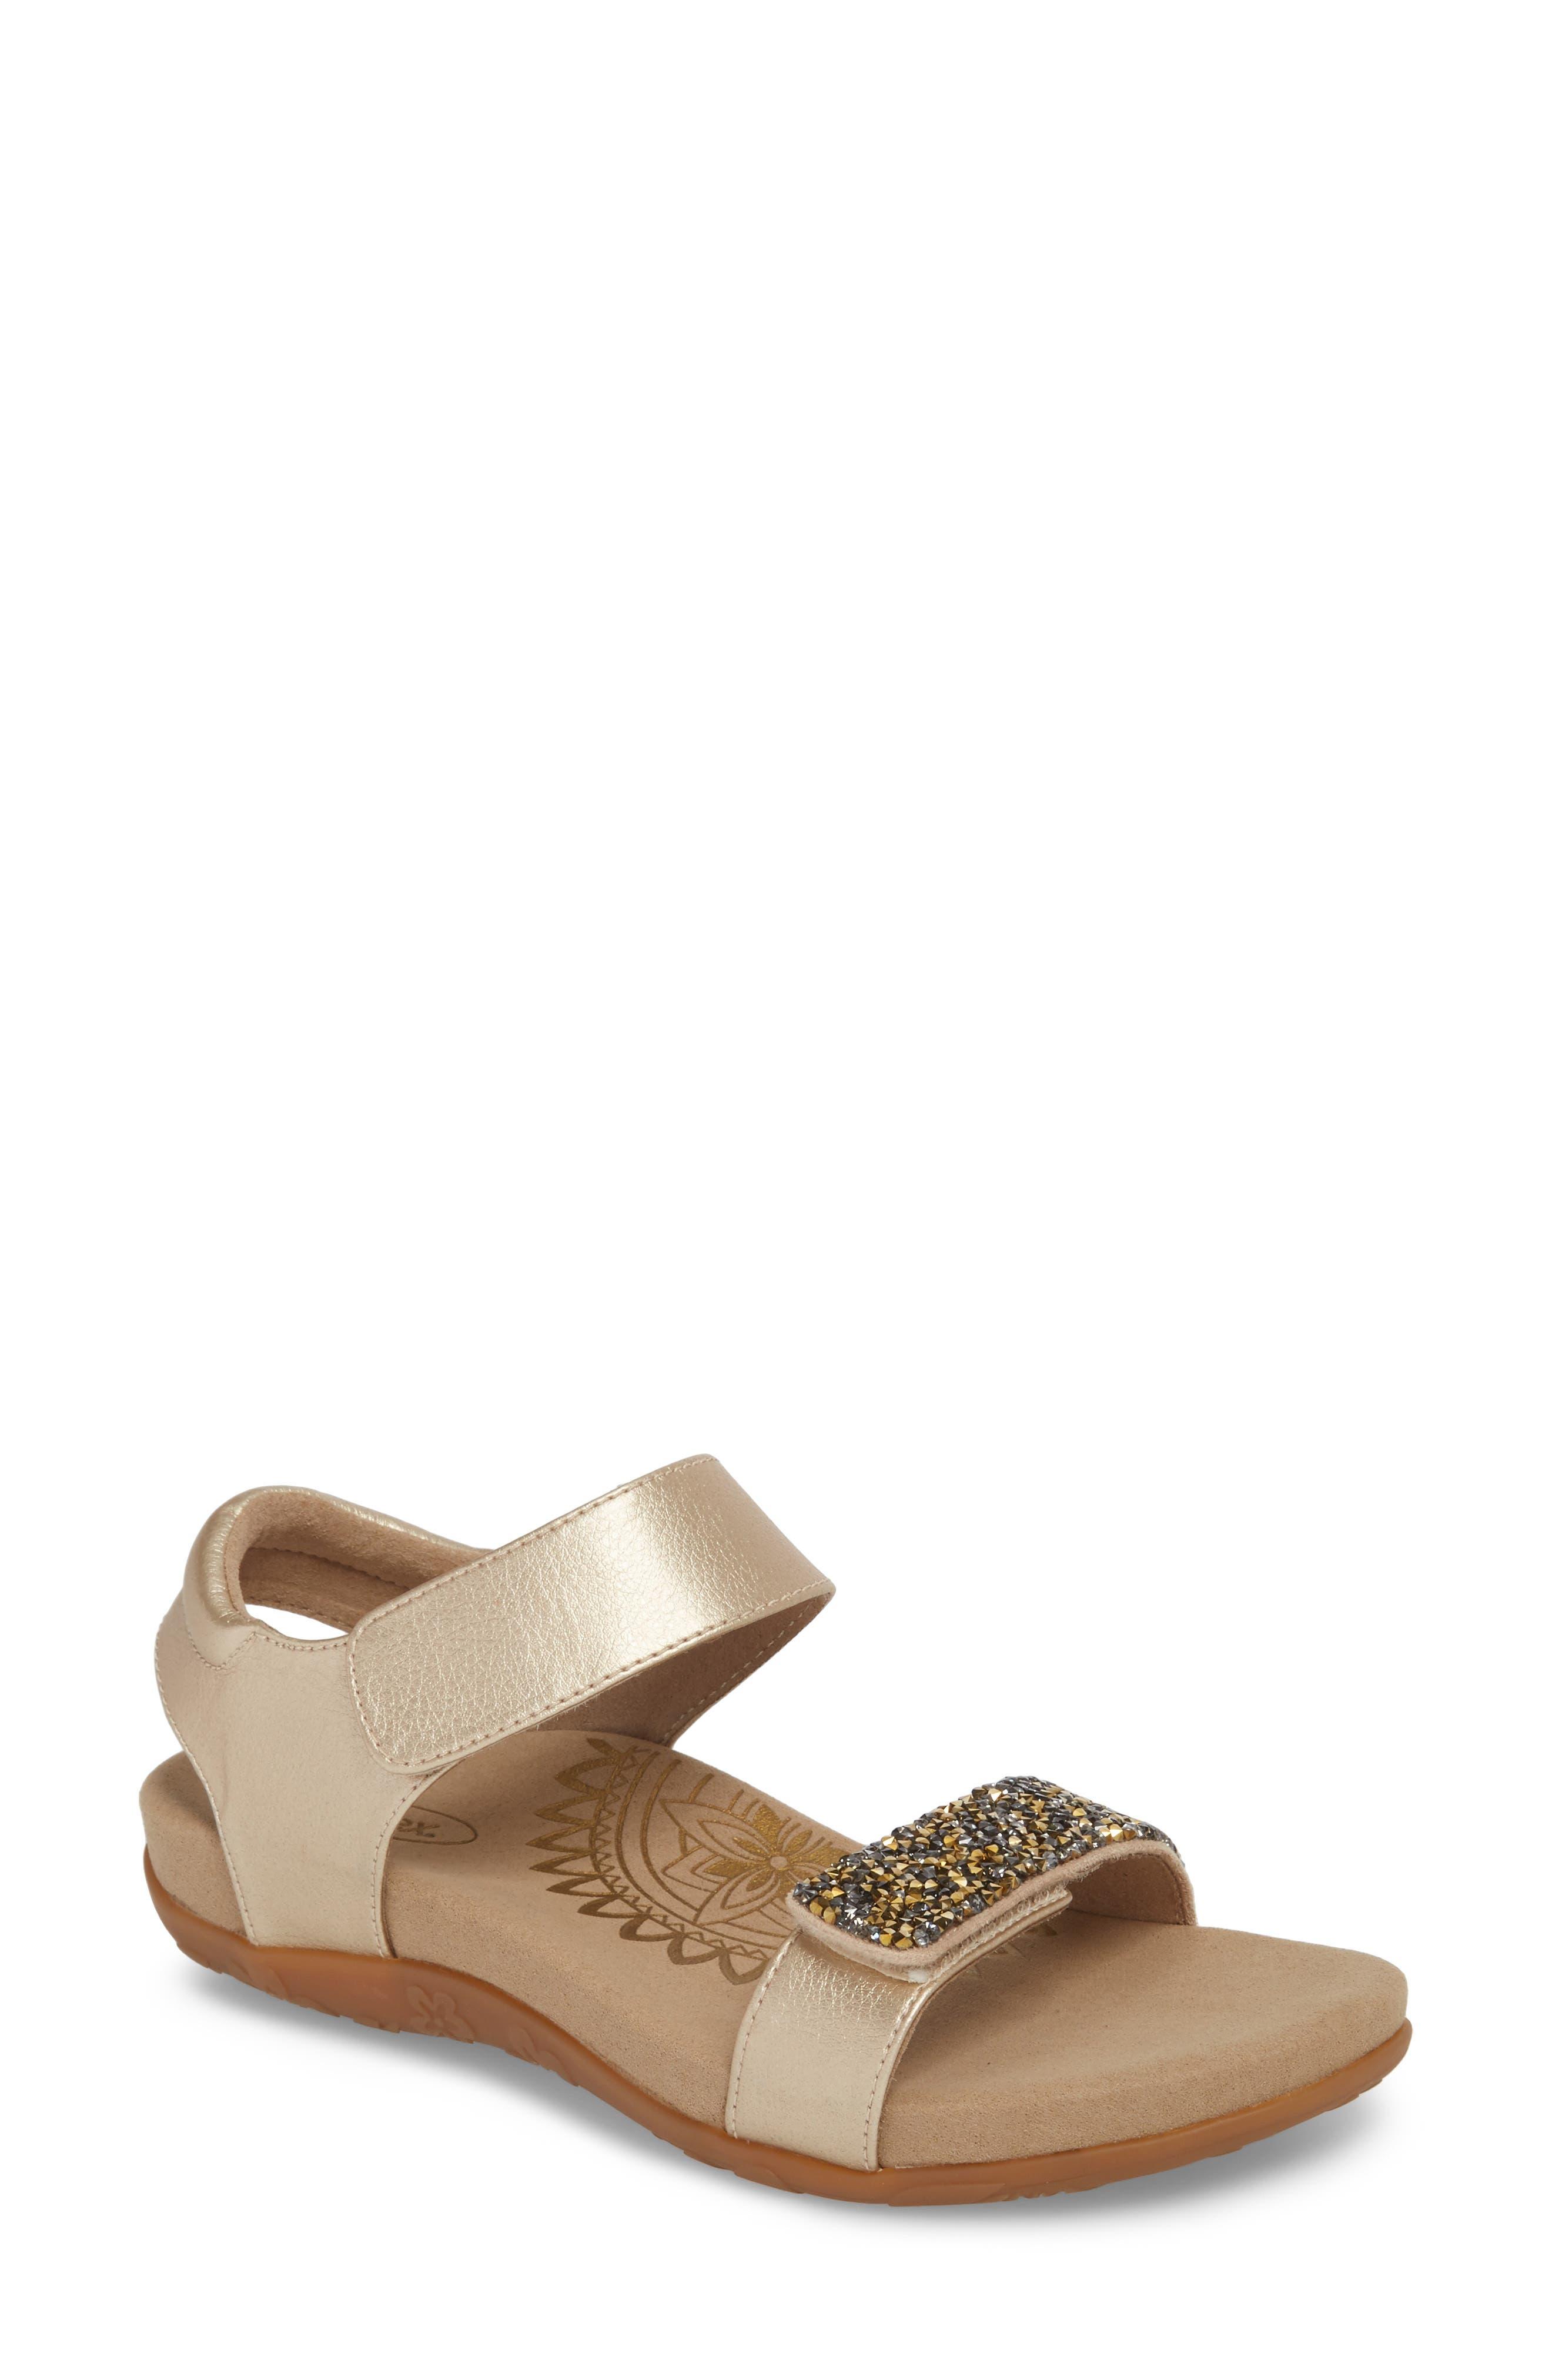 Maria Embellished Sandal,                             Main thumbnail 1, color,                             Gold Leather